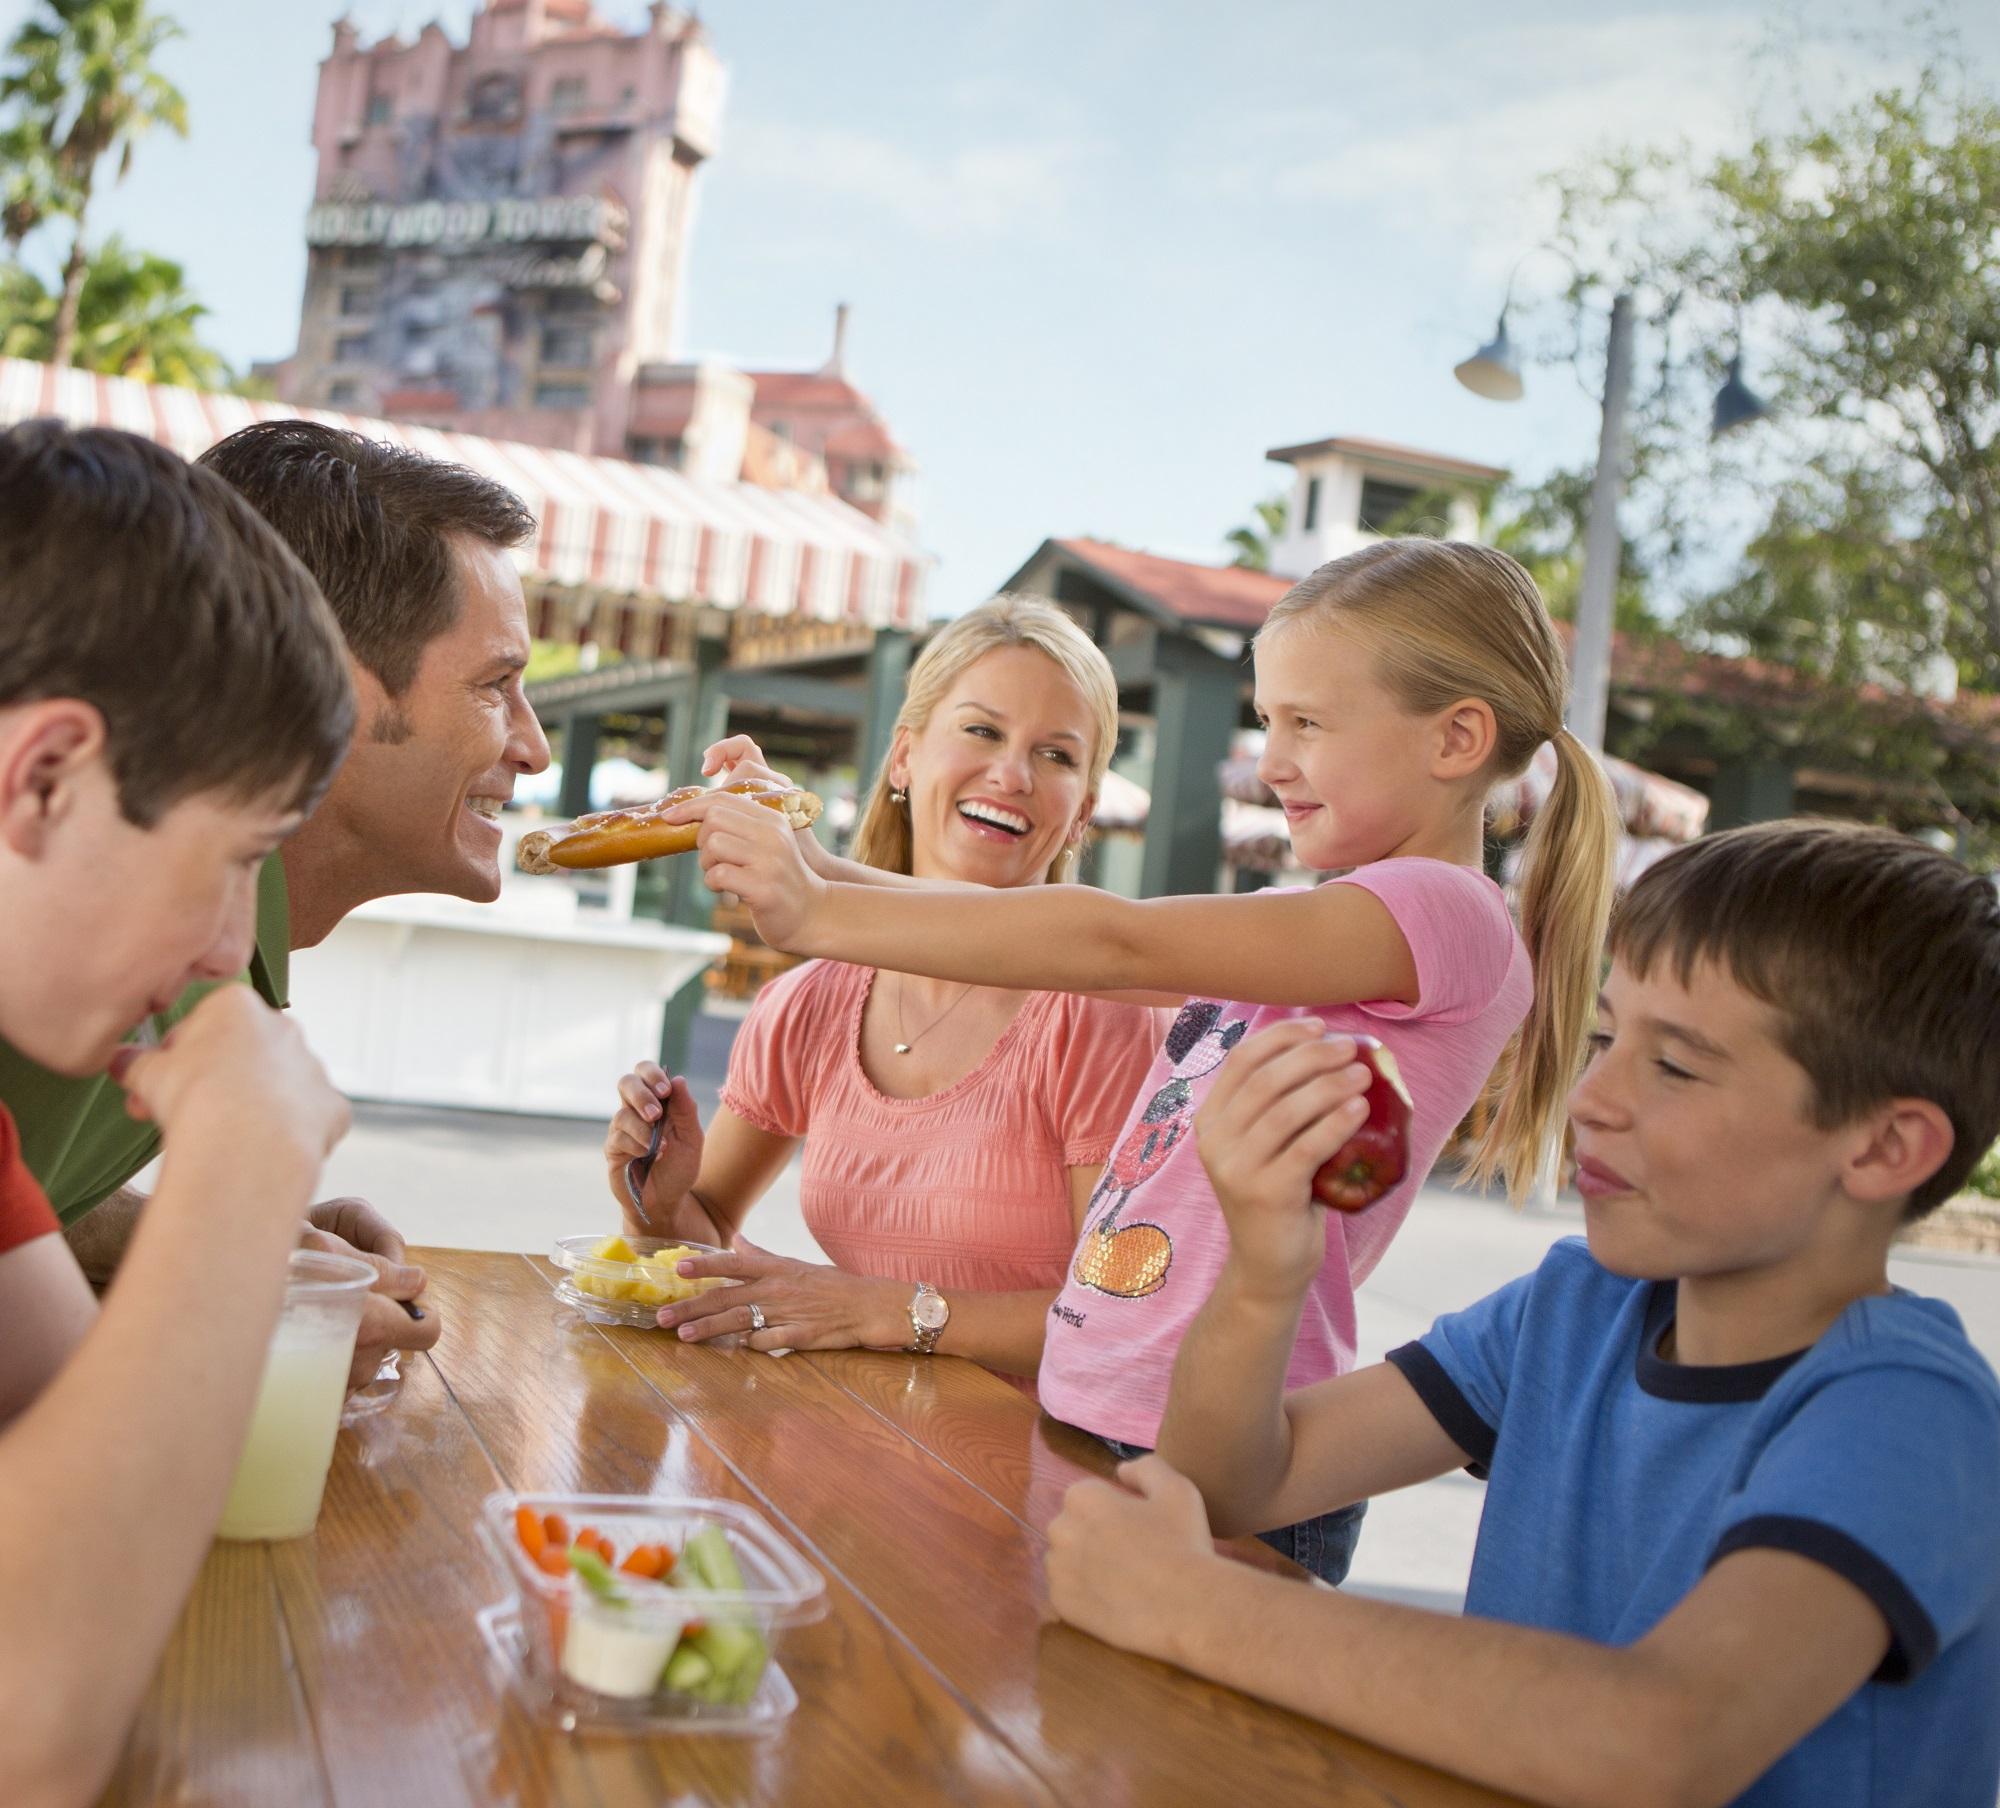 travel deals at Brads Deals, family at Disney World